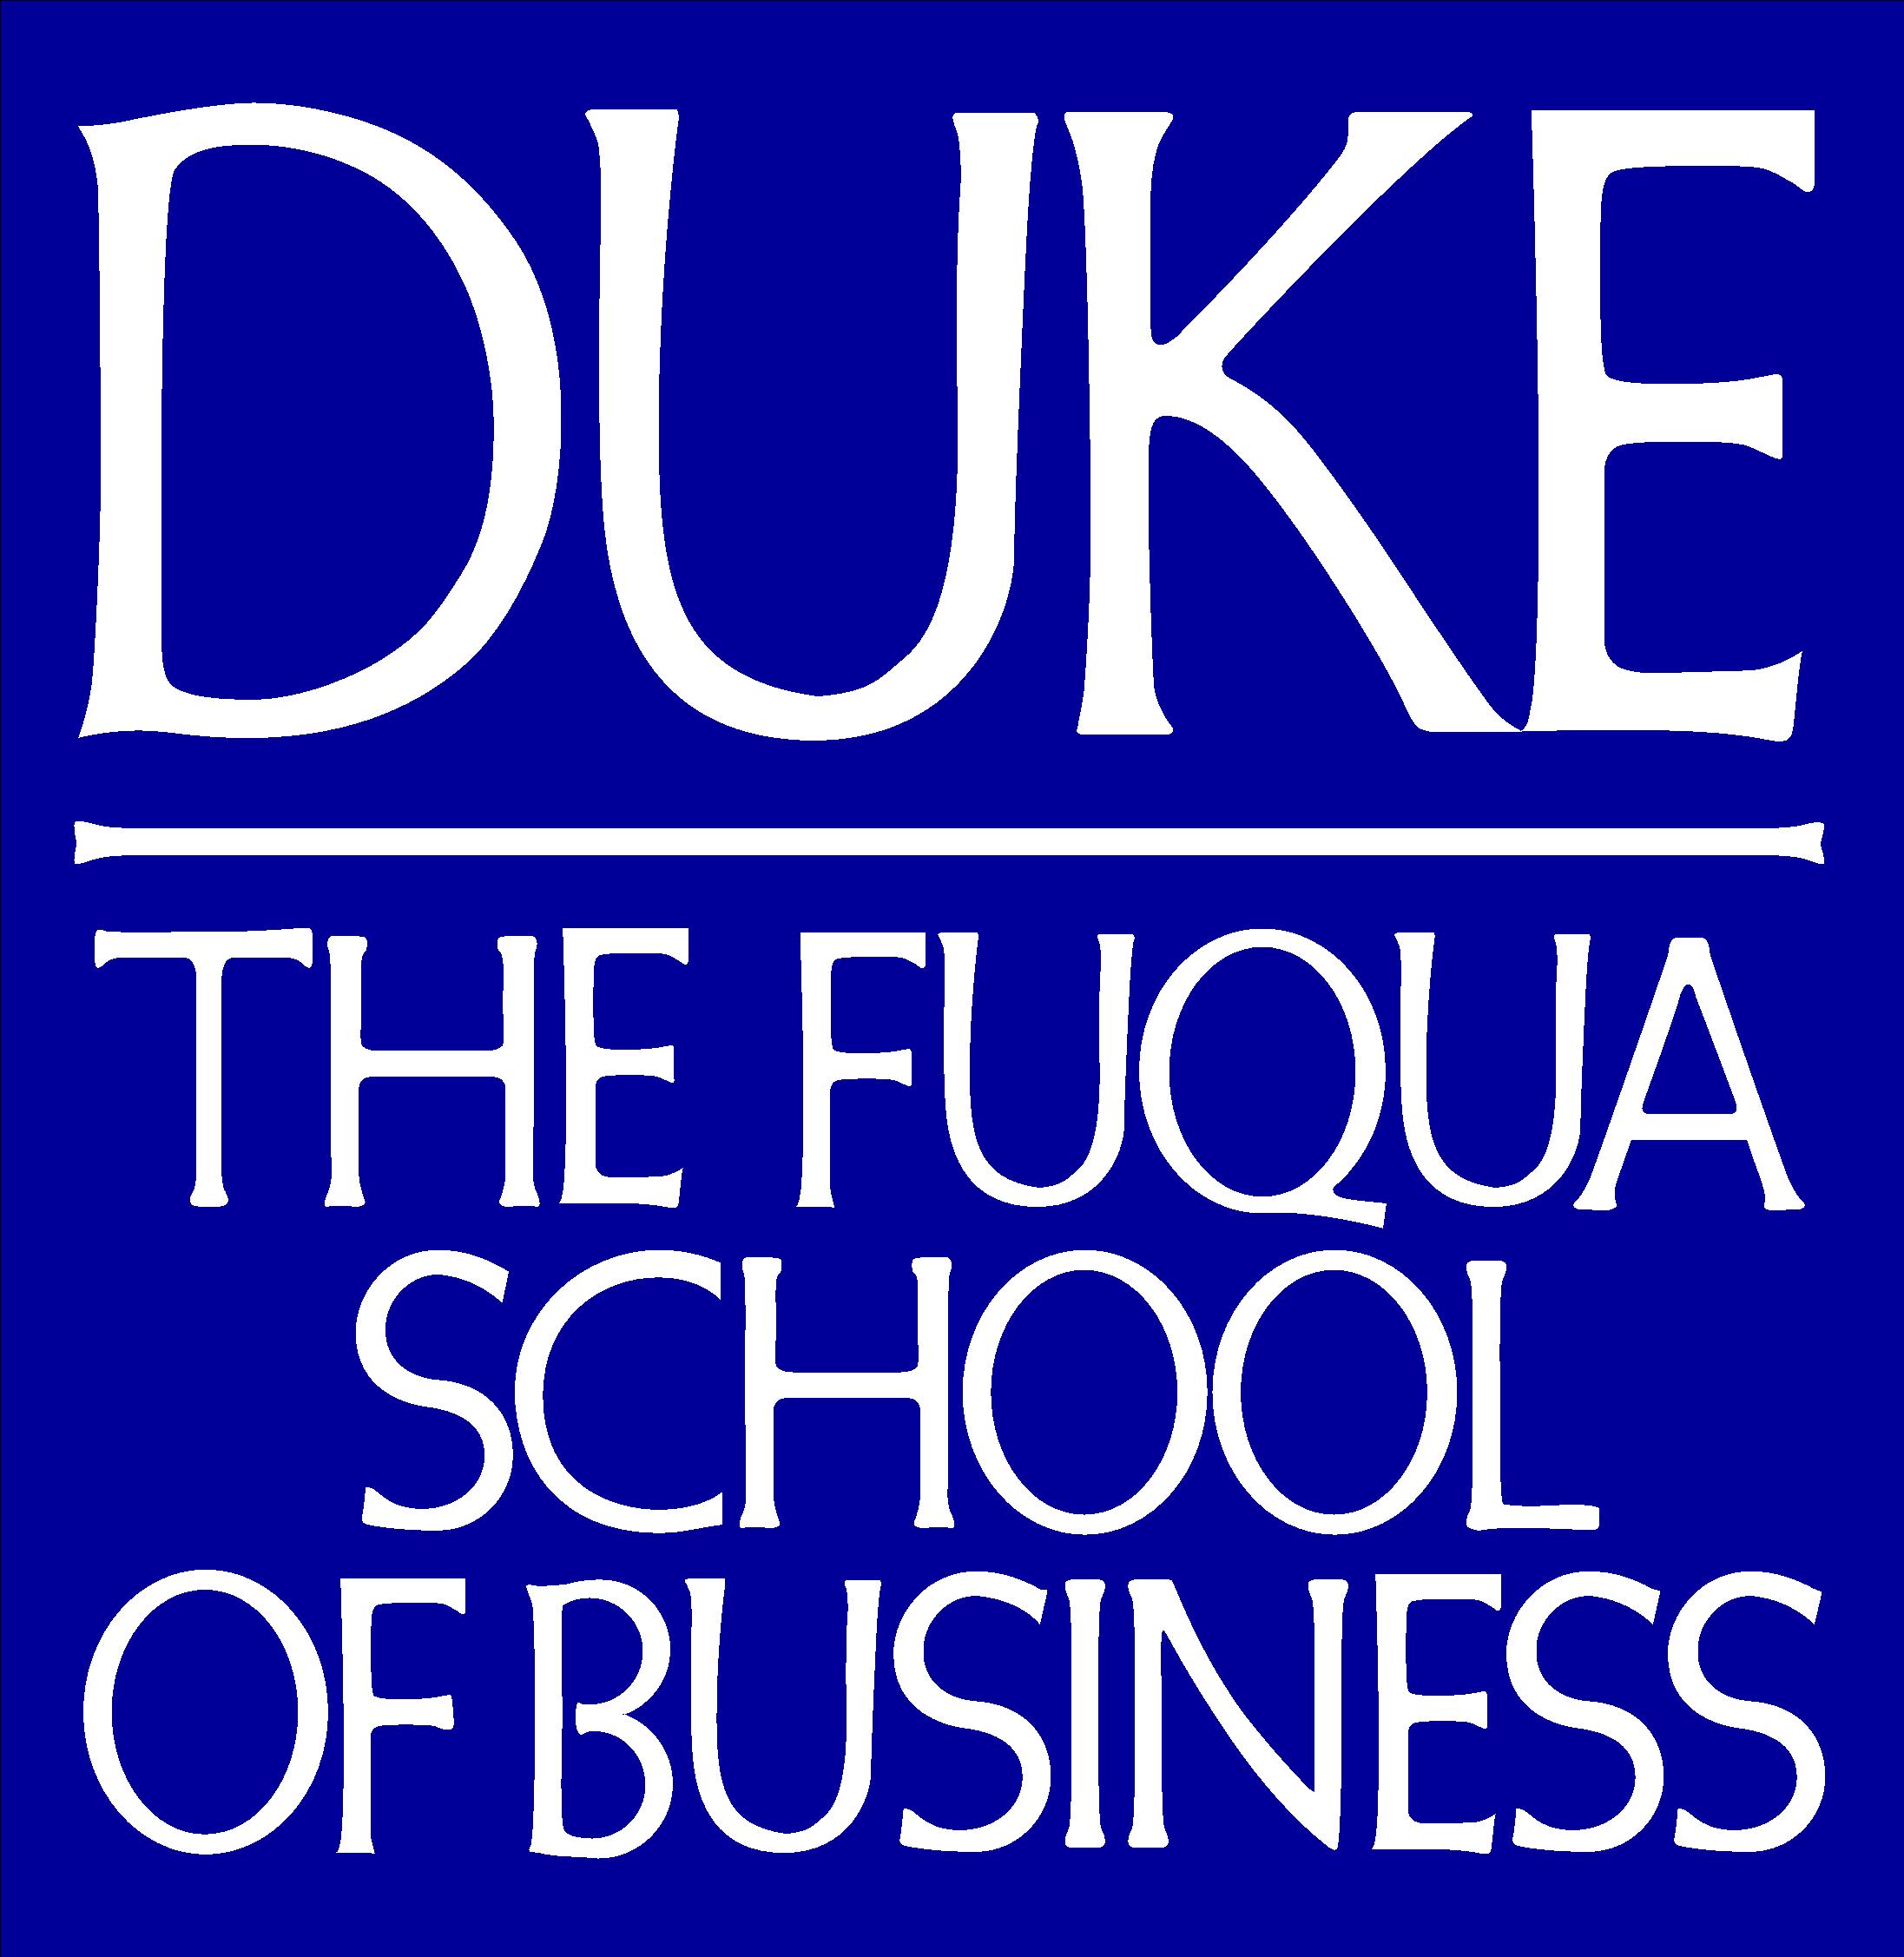 001 Fuqua Logo Rgb000099 Essay Example Duke Mba Archaicawful Essays Analysis Examples Full